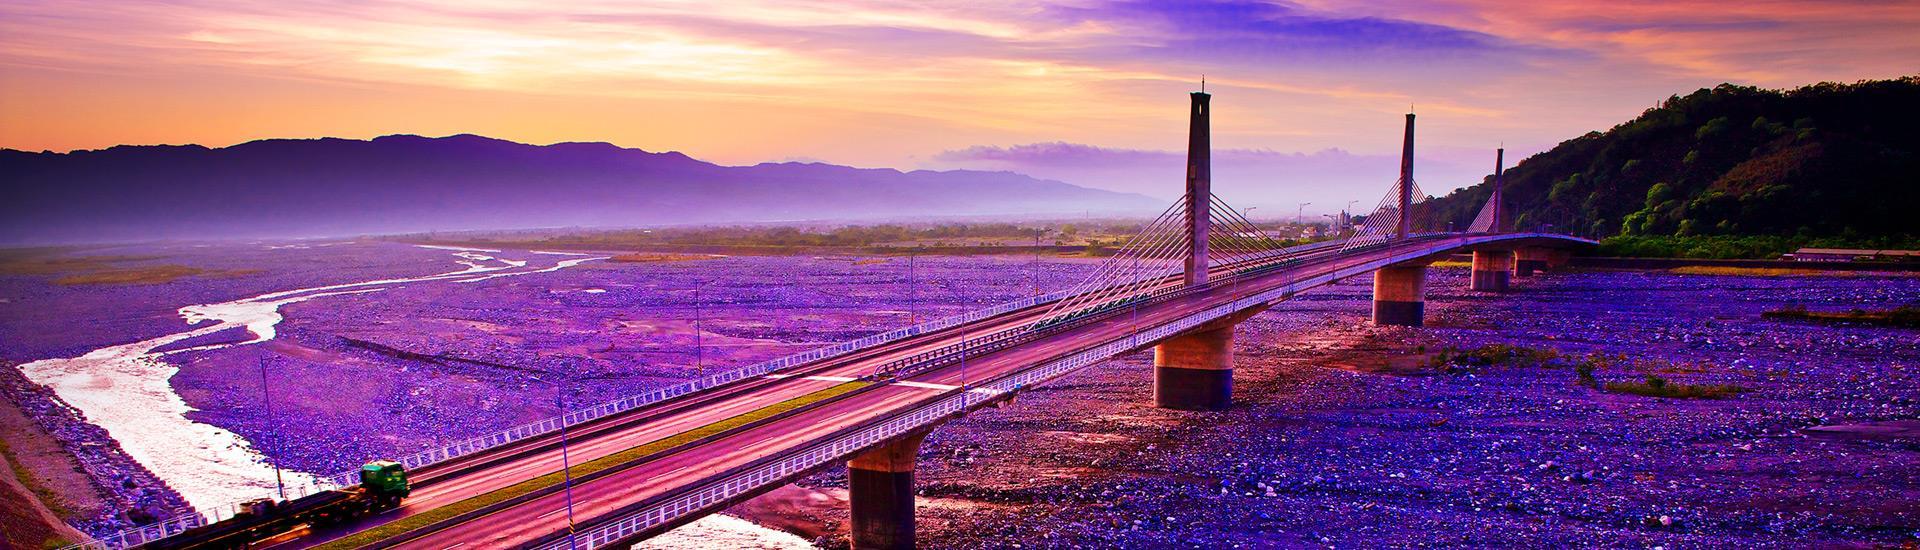 Puente Fengping